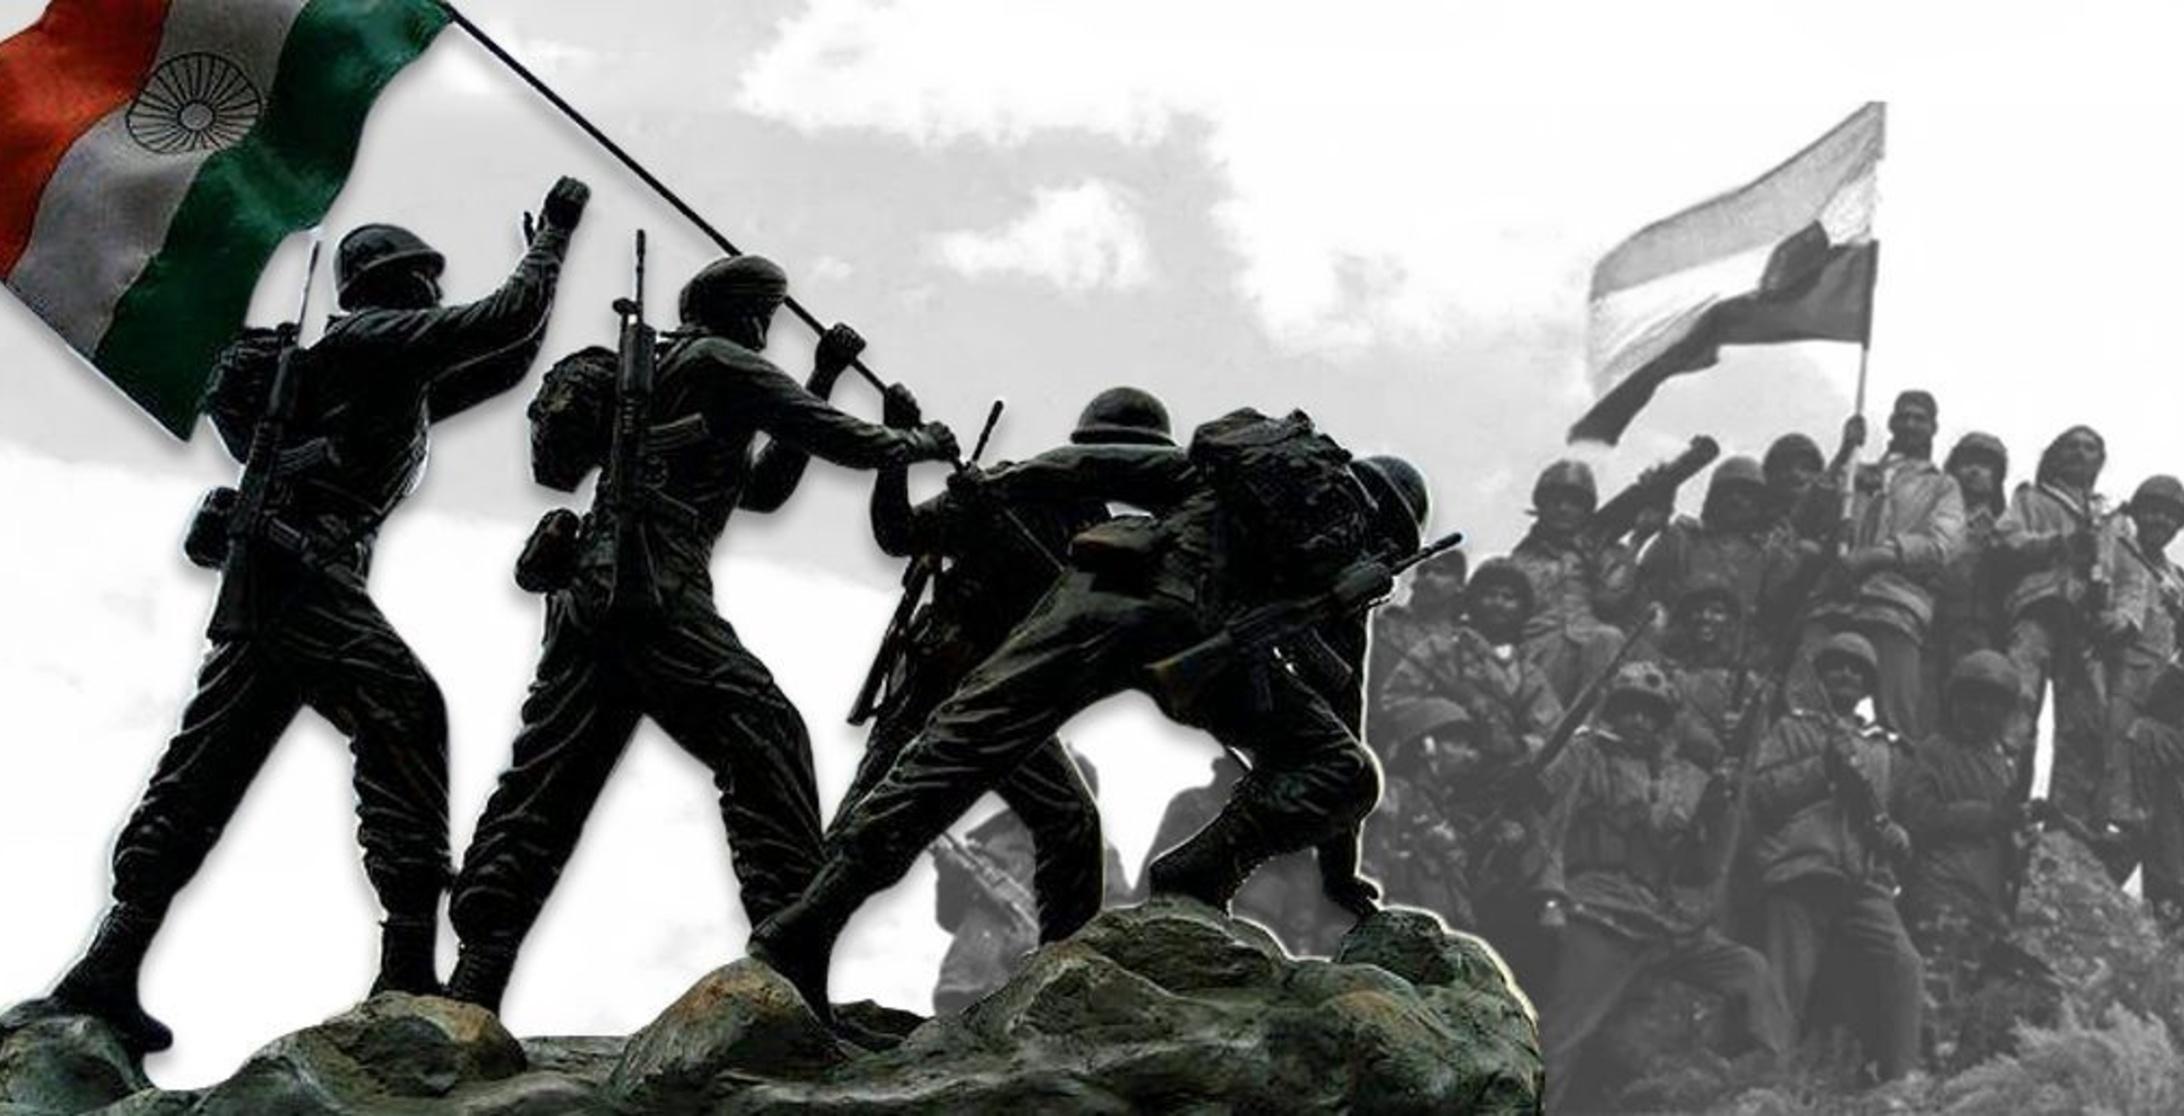 Kargil Diwas 2021: Here Are 20 Kargil War Heroes You Should Know About